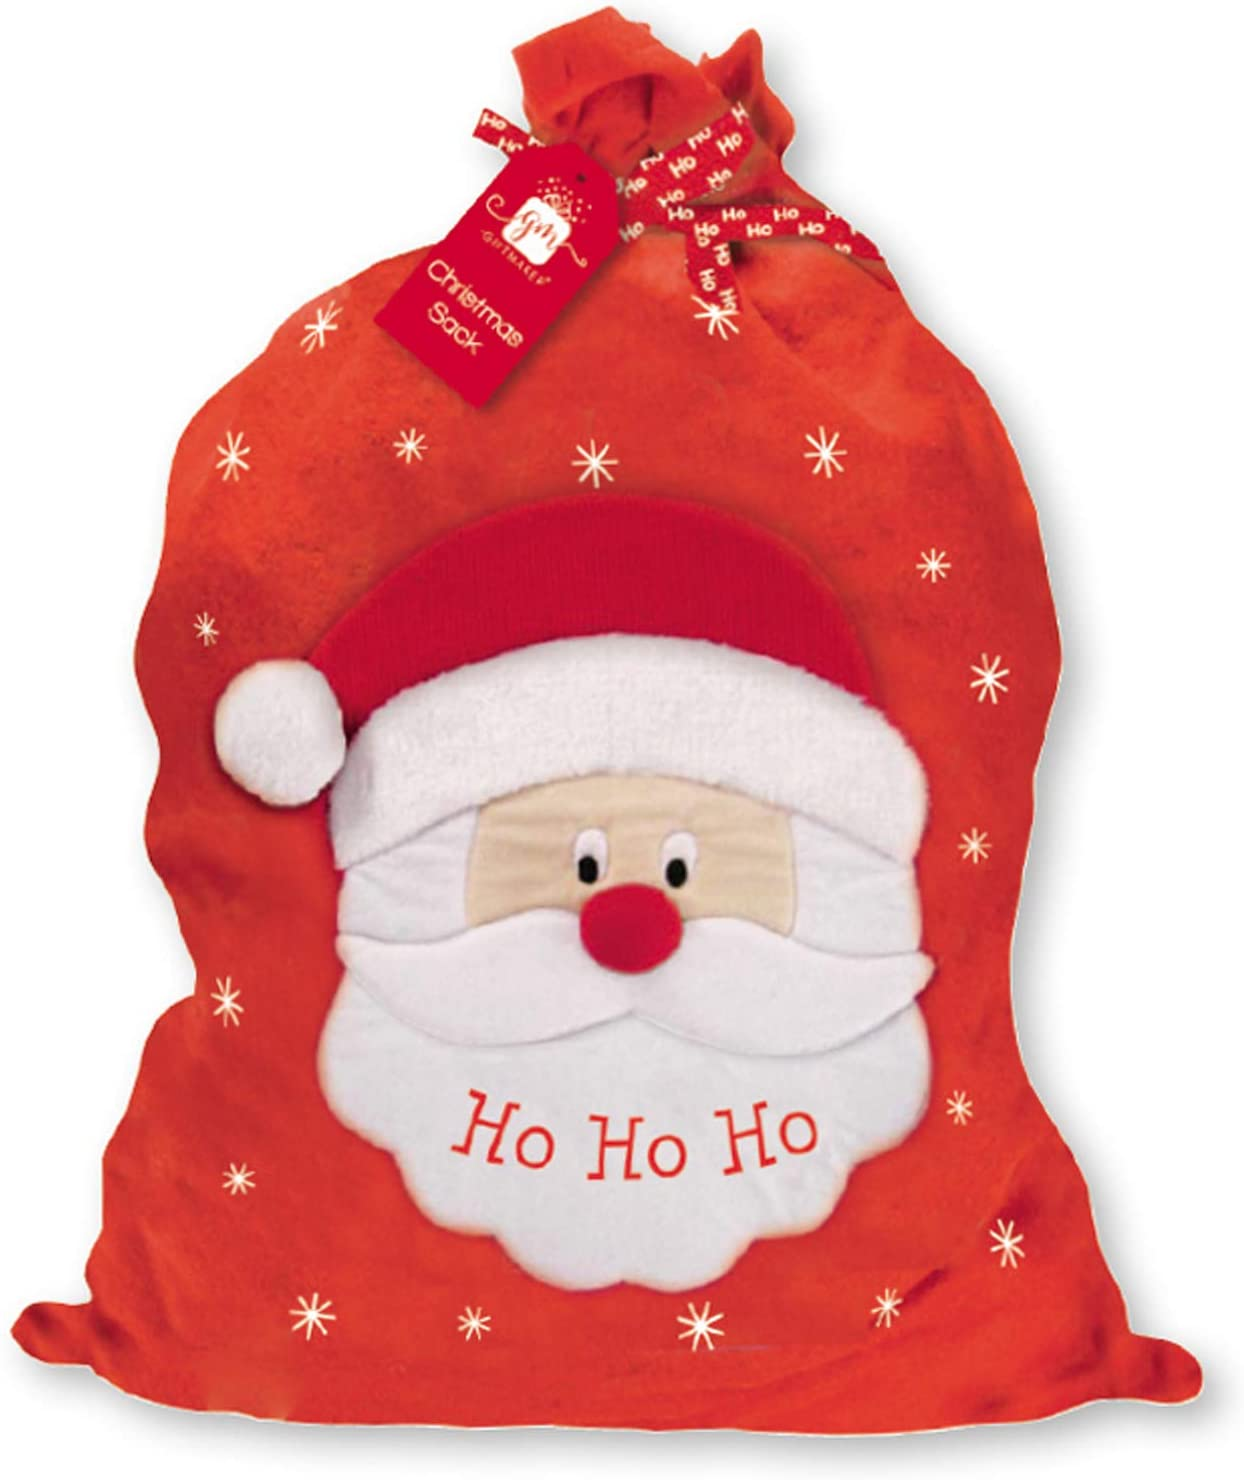 Giftmaker Large Velour Santa's Sack Ho Ho Ho 70x 60cm